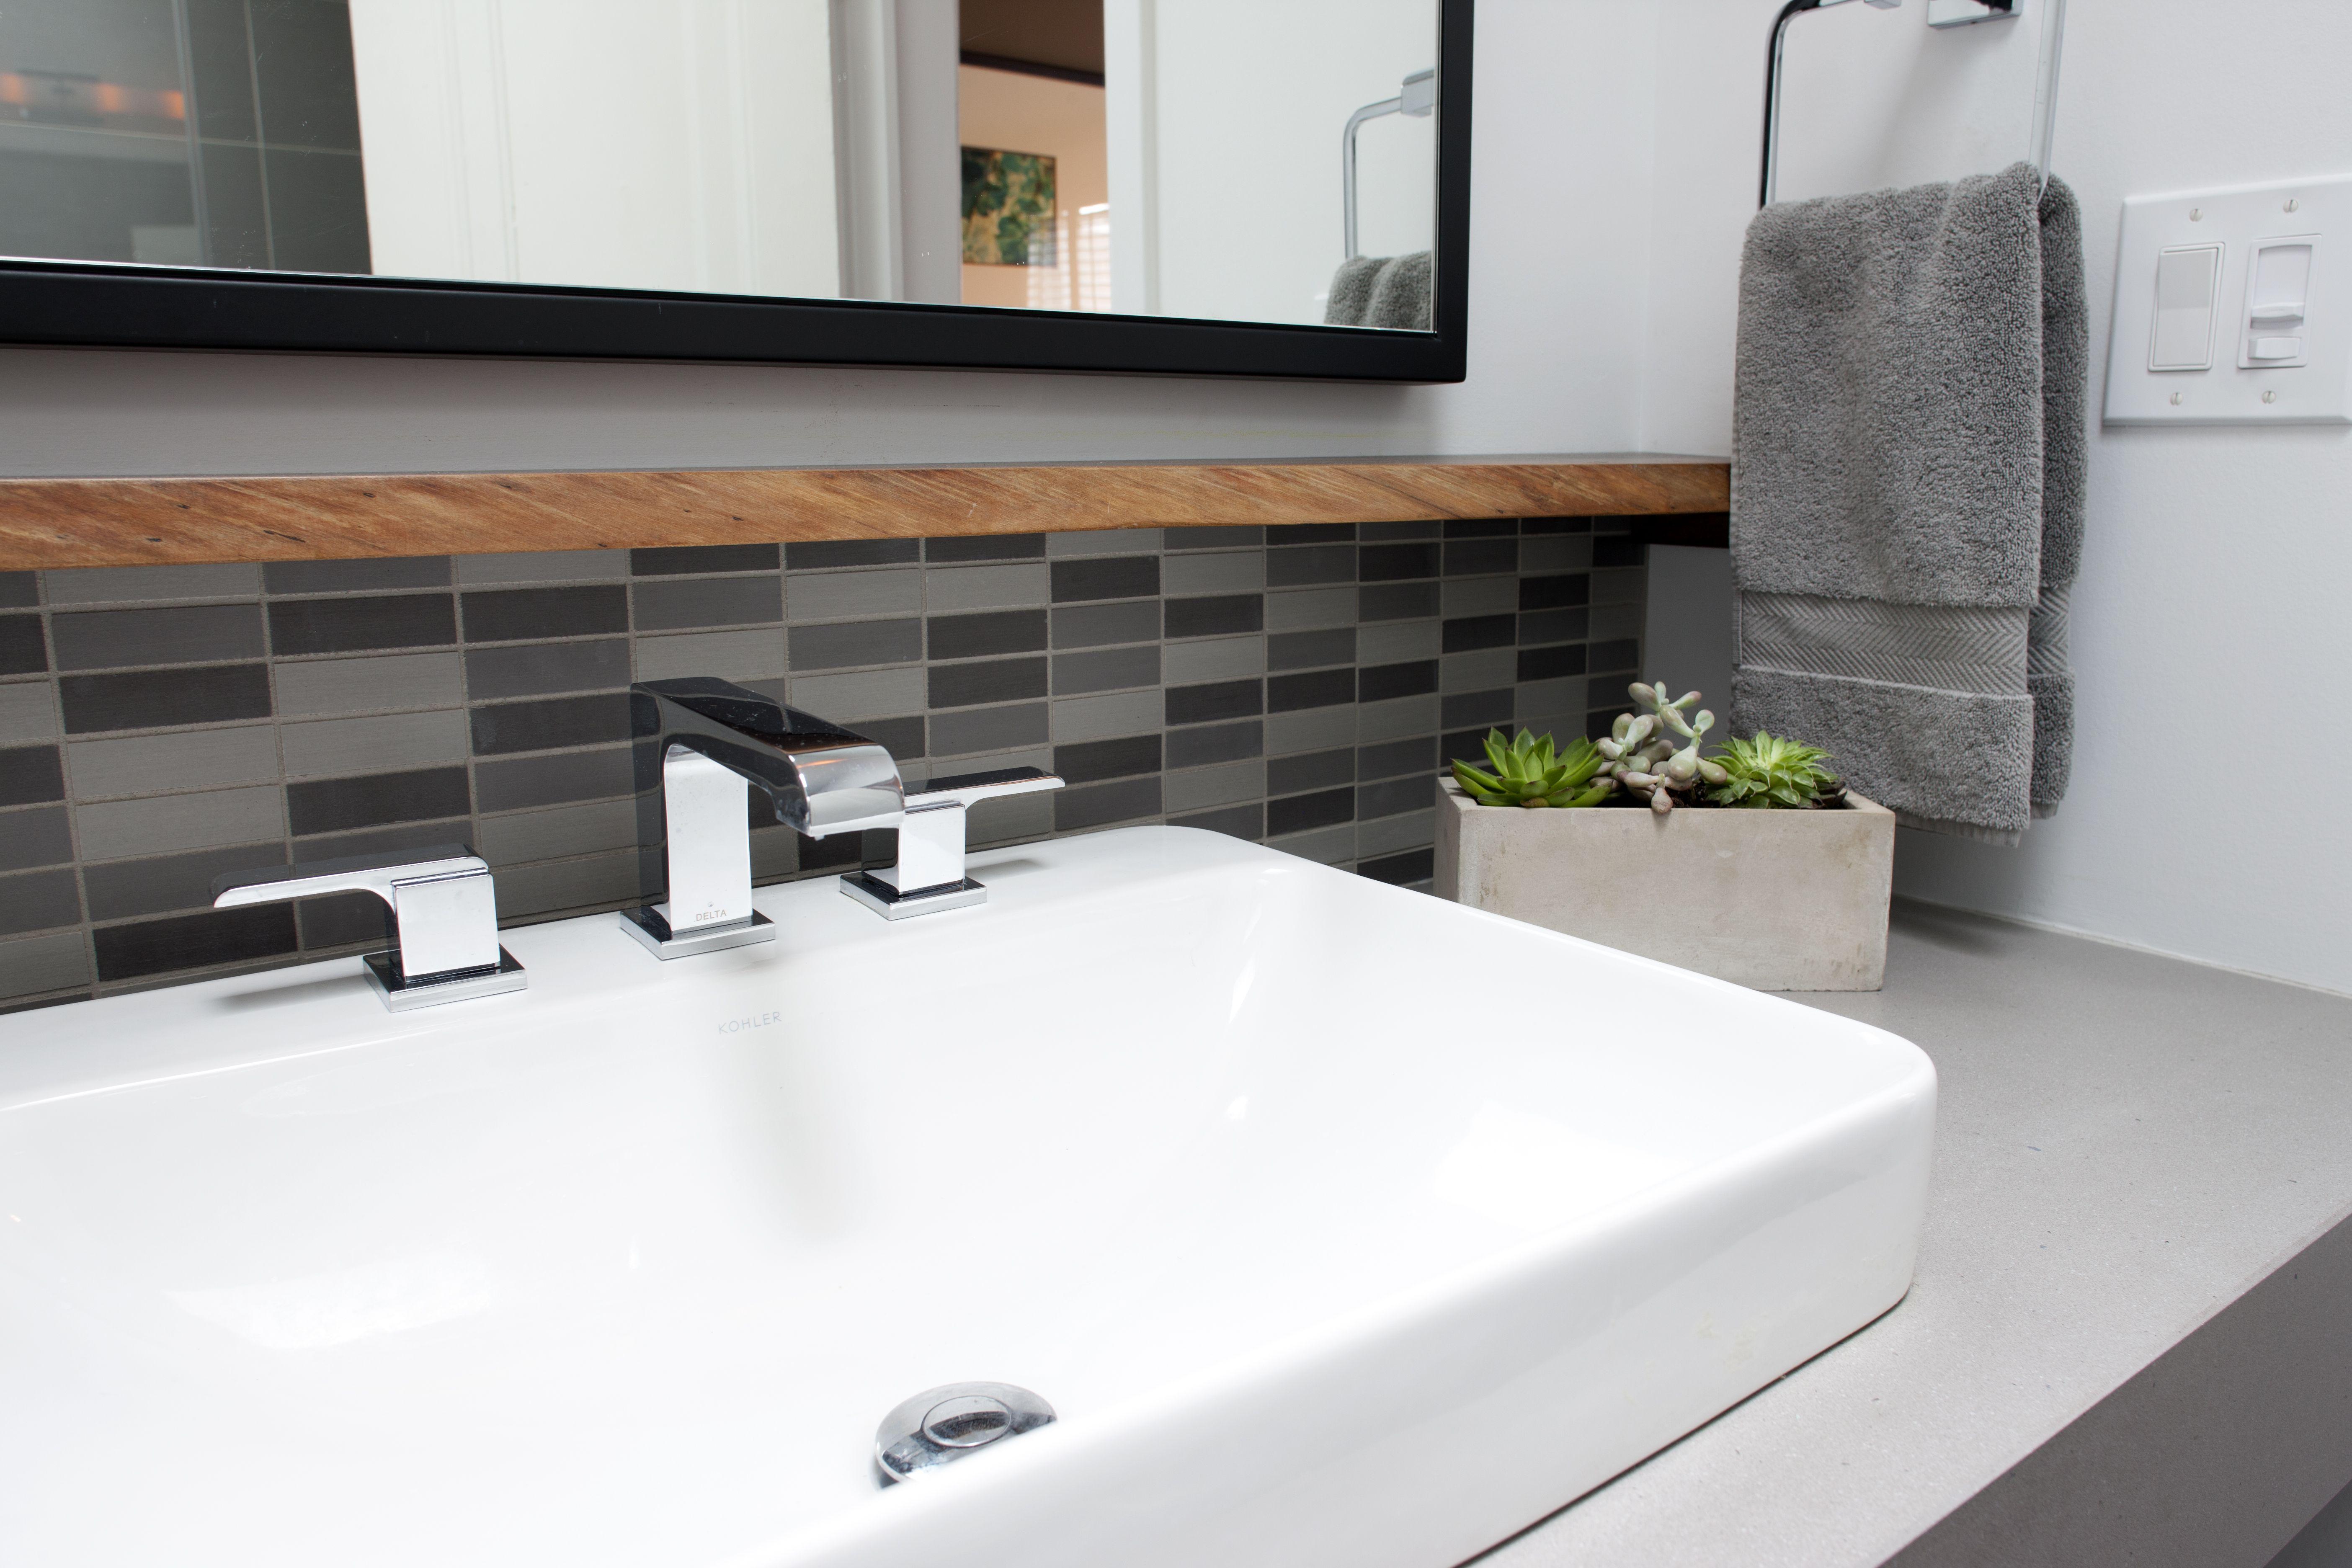 Warm Gray Porcelain Tiles Create A